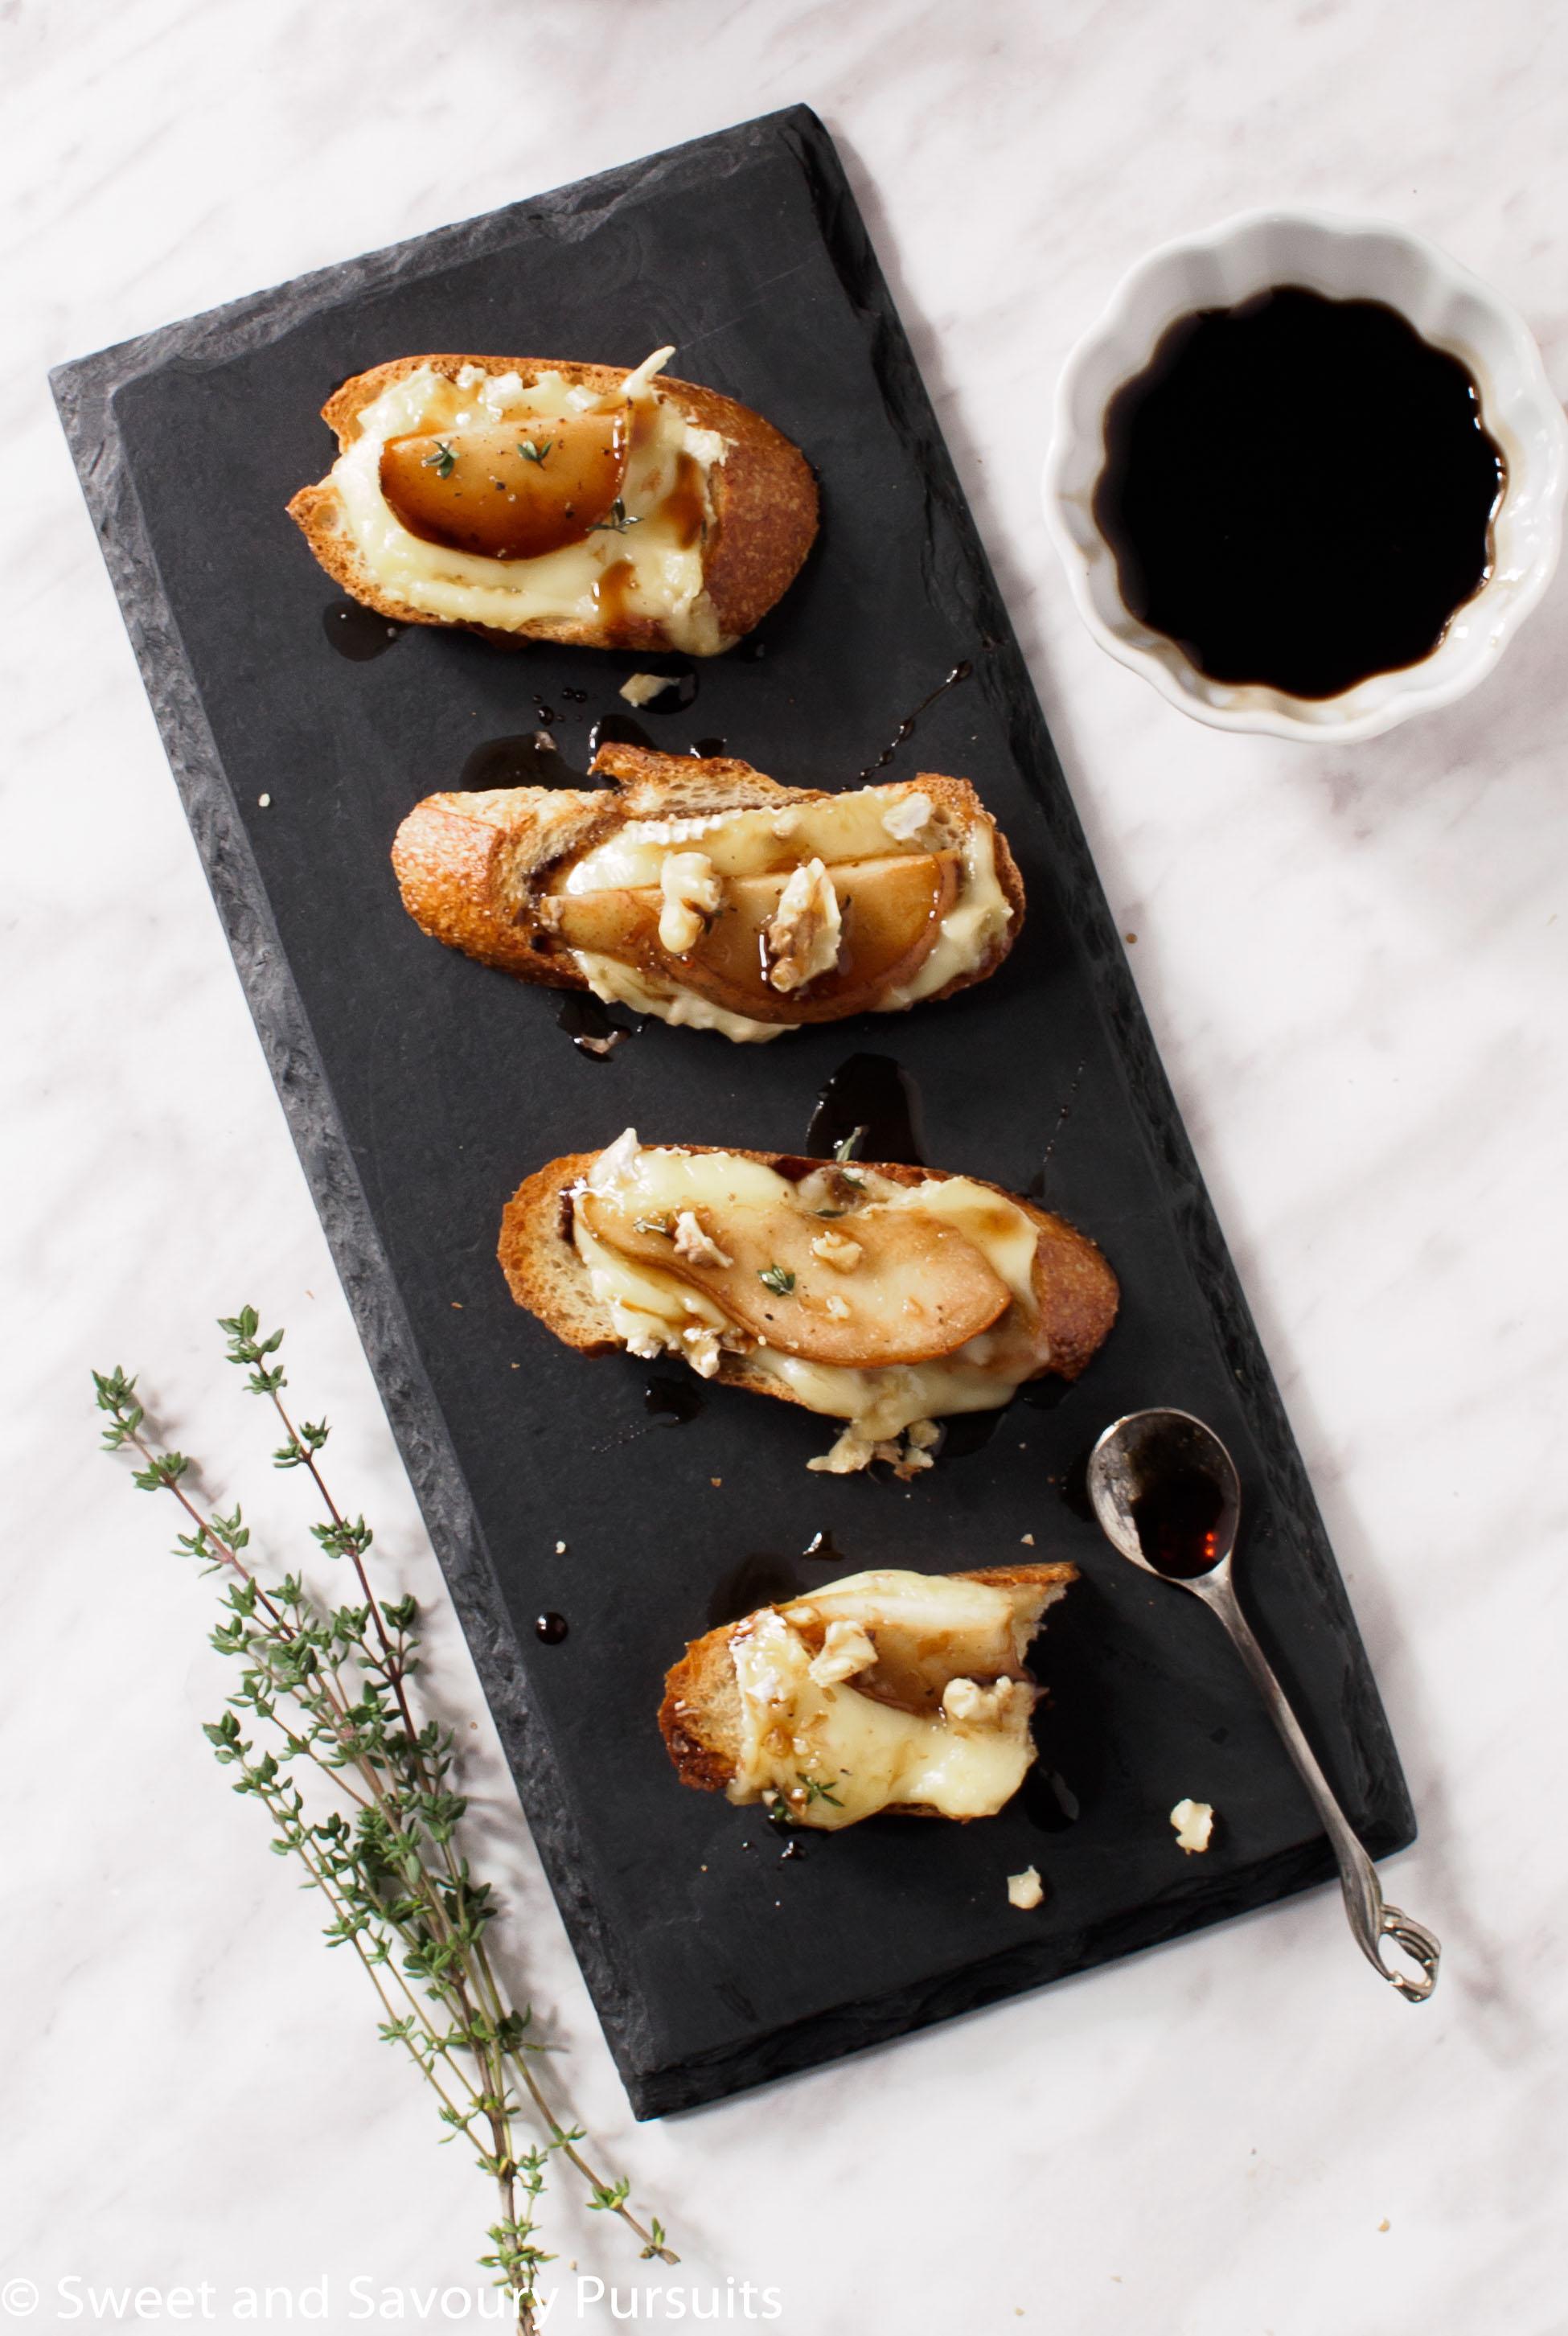 Pear and Brie Crostini